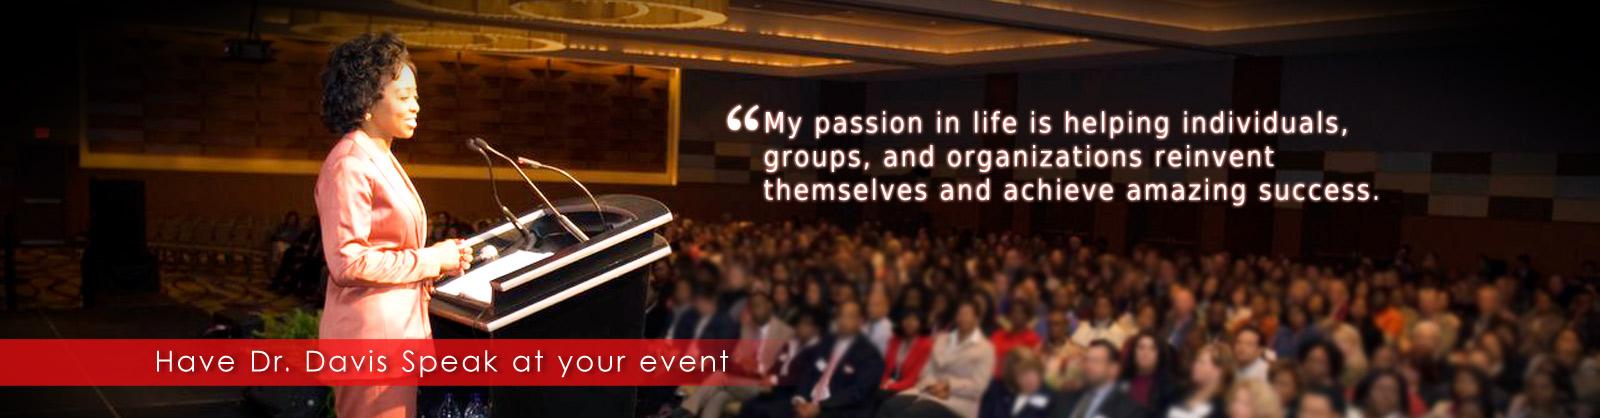 Have Dr. Davis speak at your event